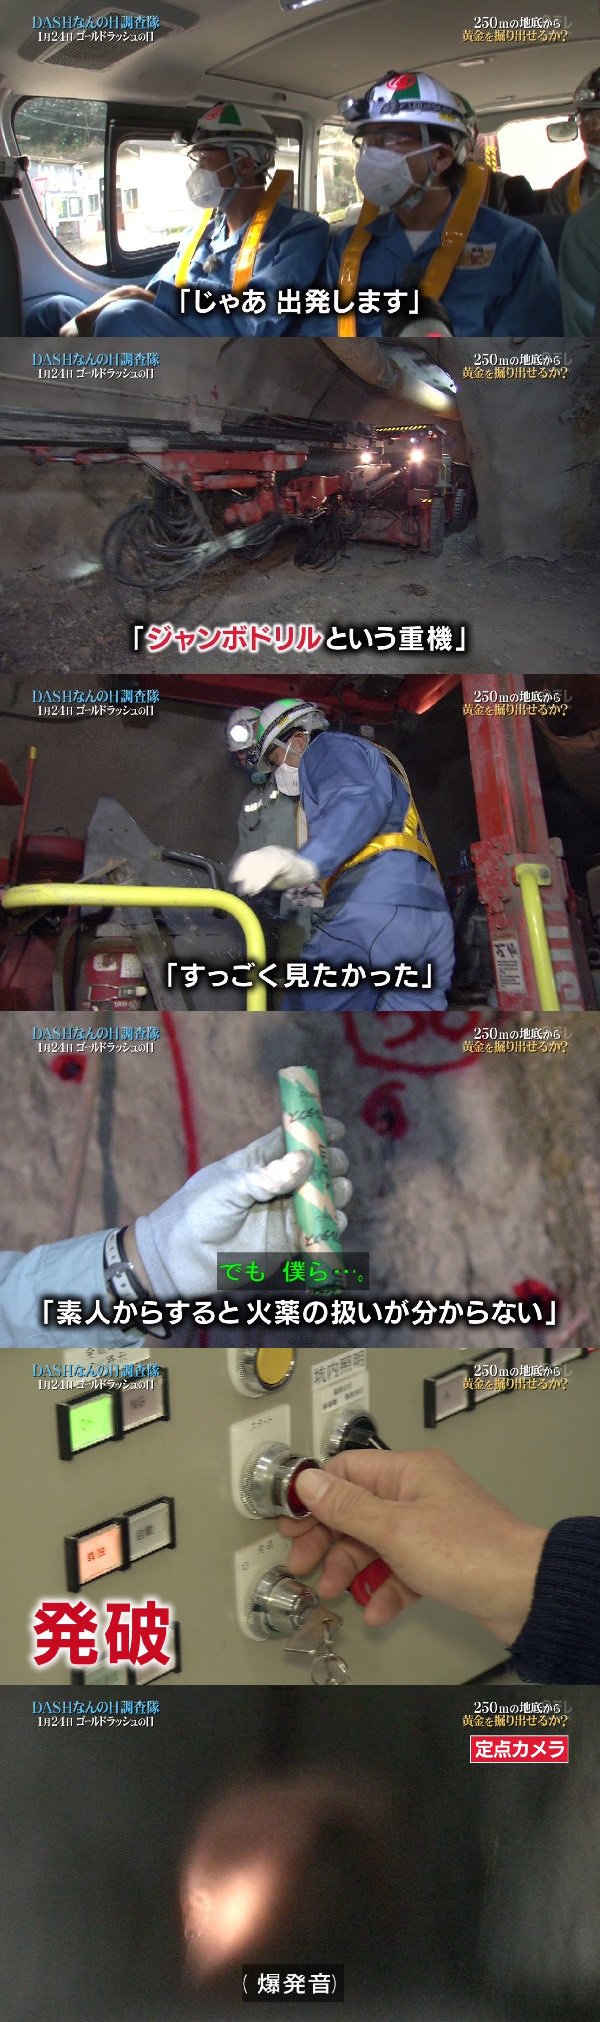 TOKIO 指輪 岩 金 鉄腕DASH!に関連した画像-02